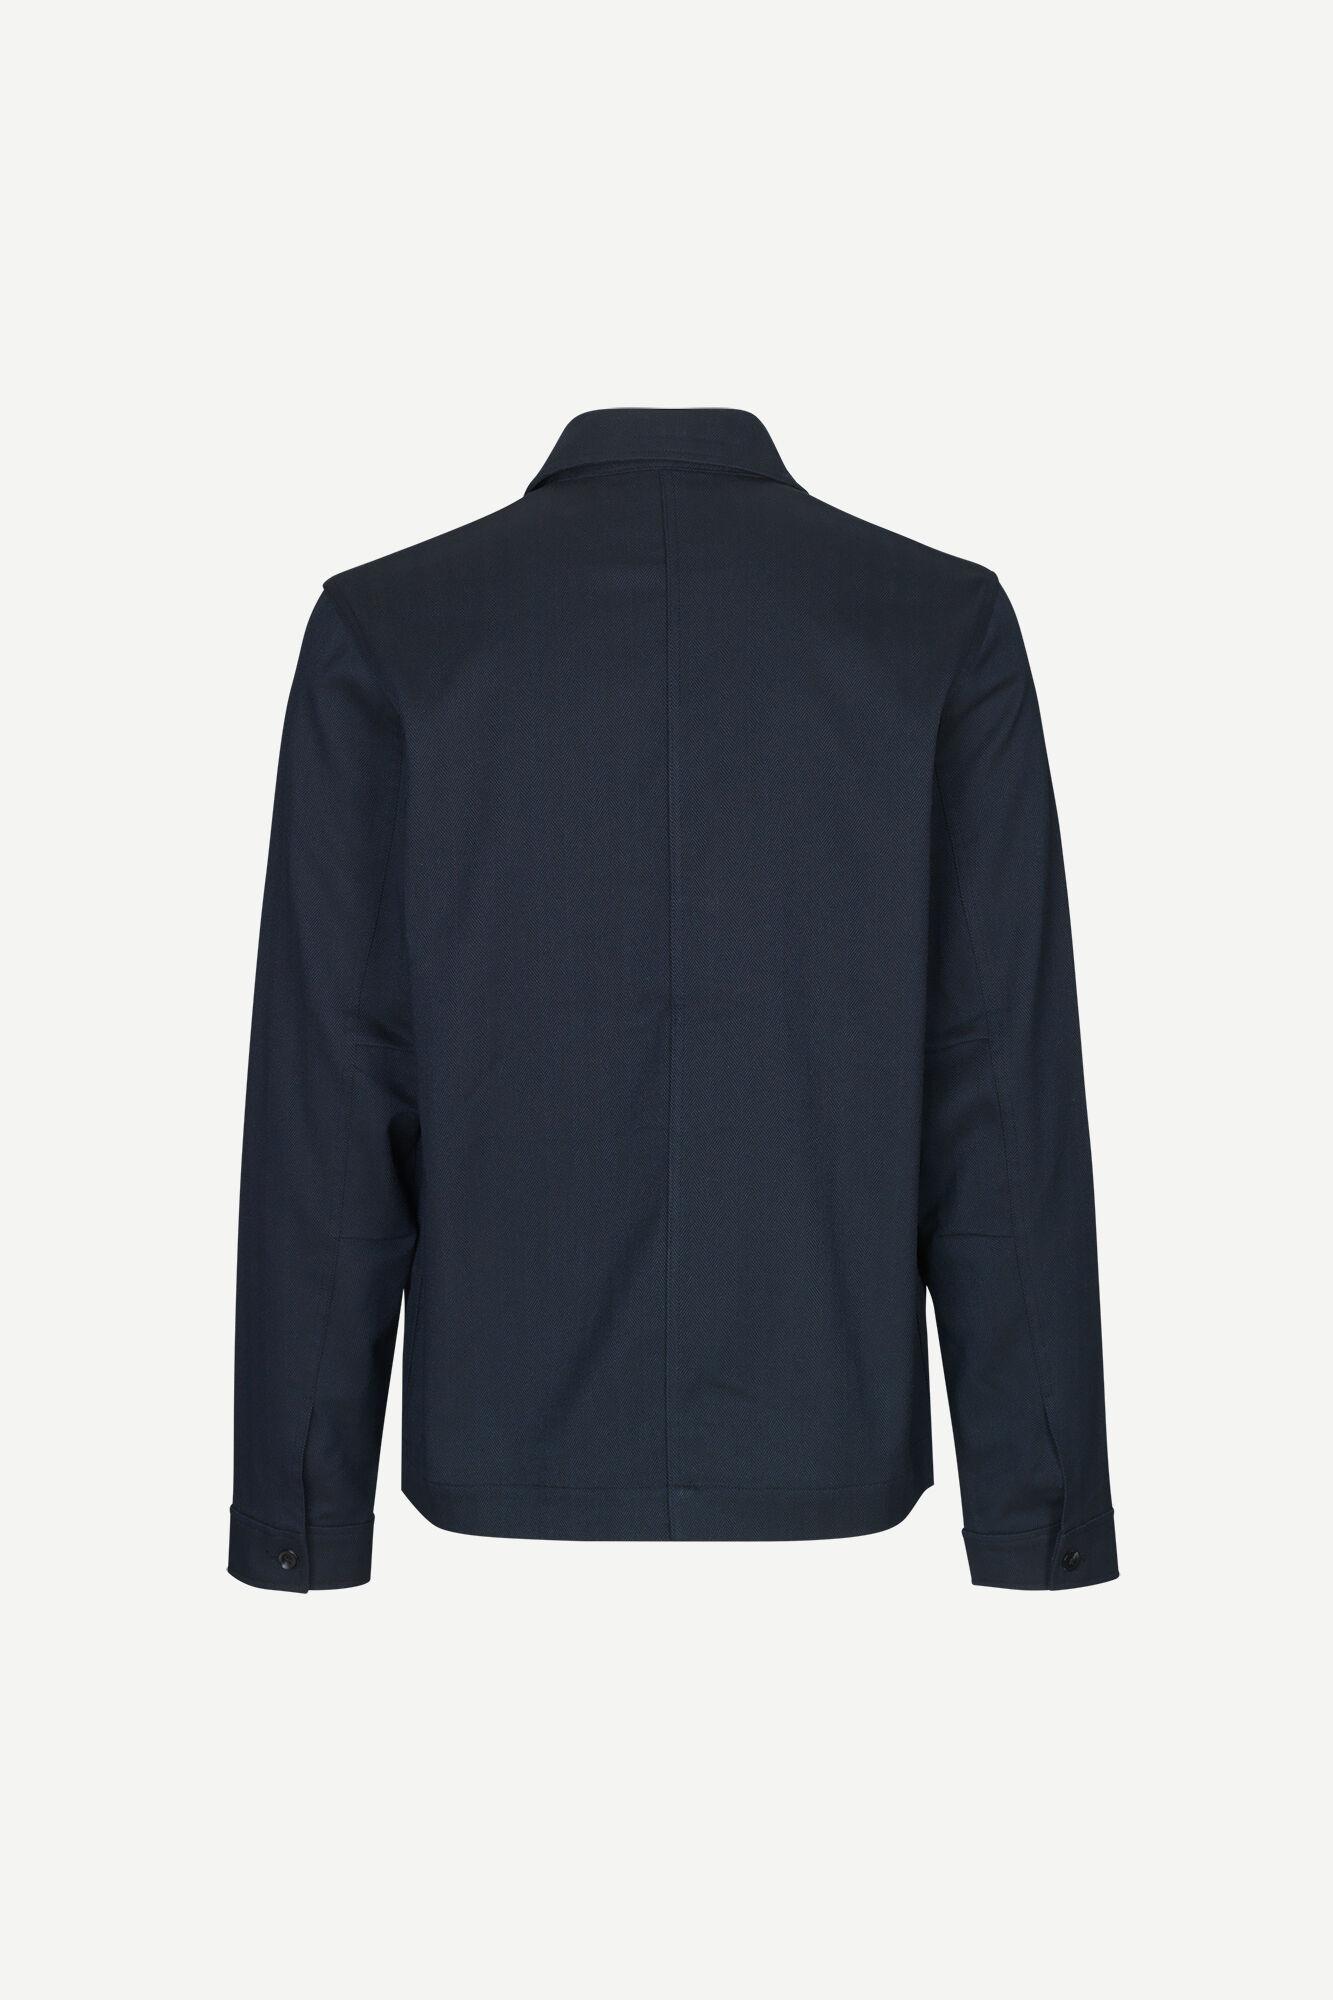 New Worker jacket 11024